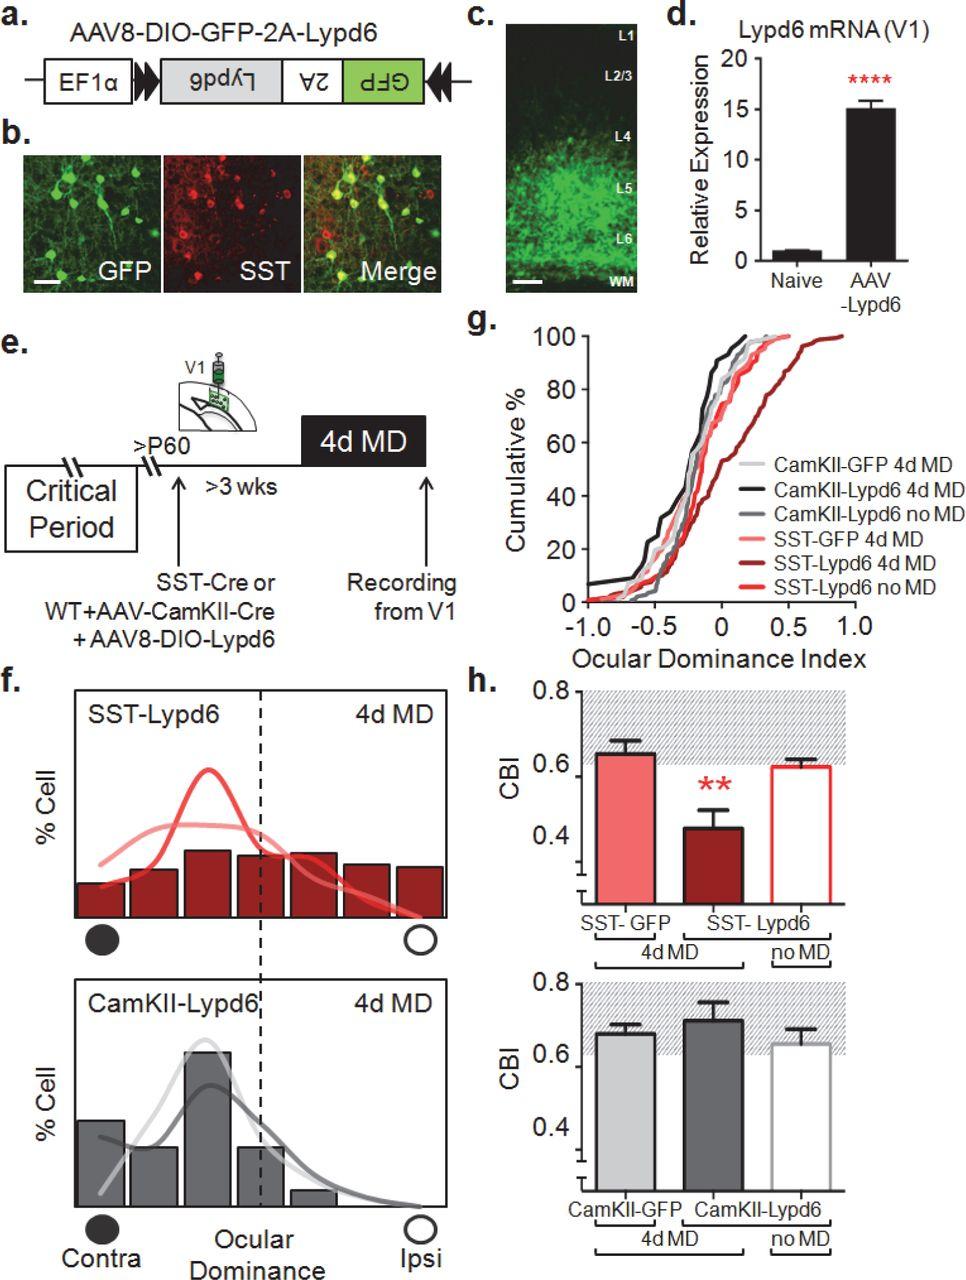 Activation of Somatostatin Inhibitory Neurons by Lypd6-nAChRα2